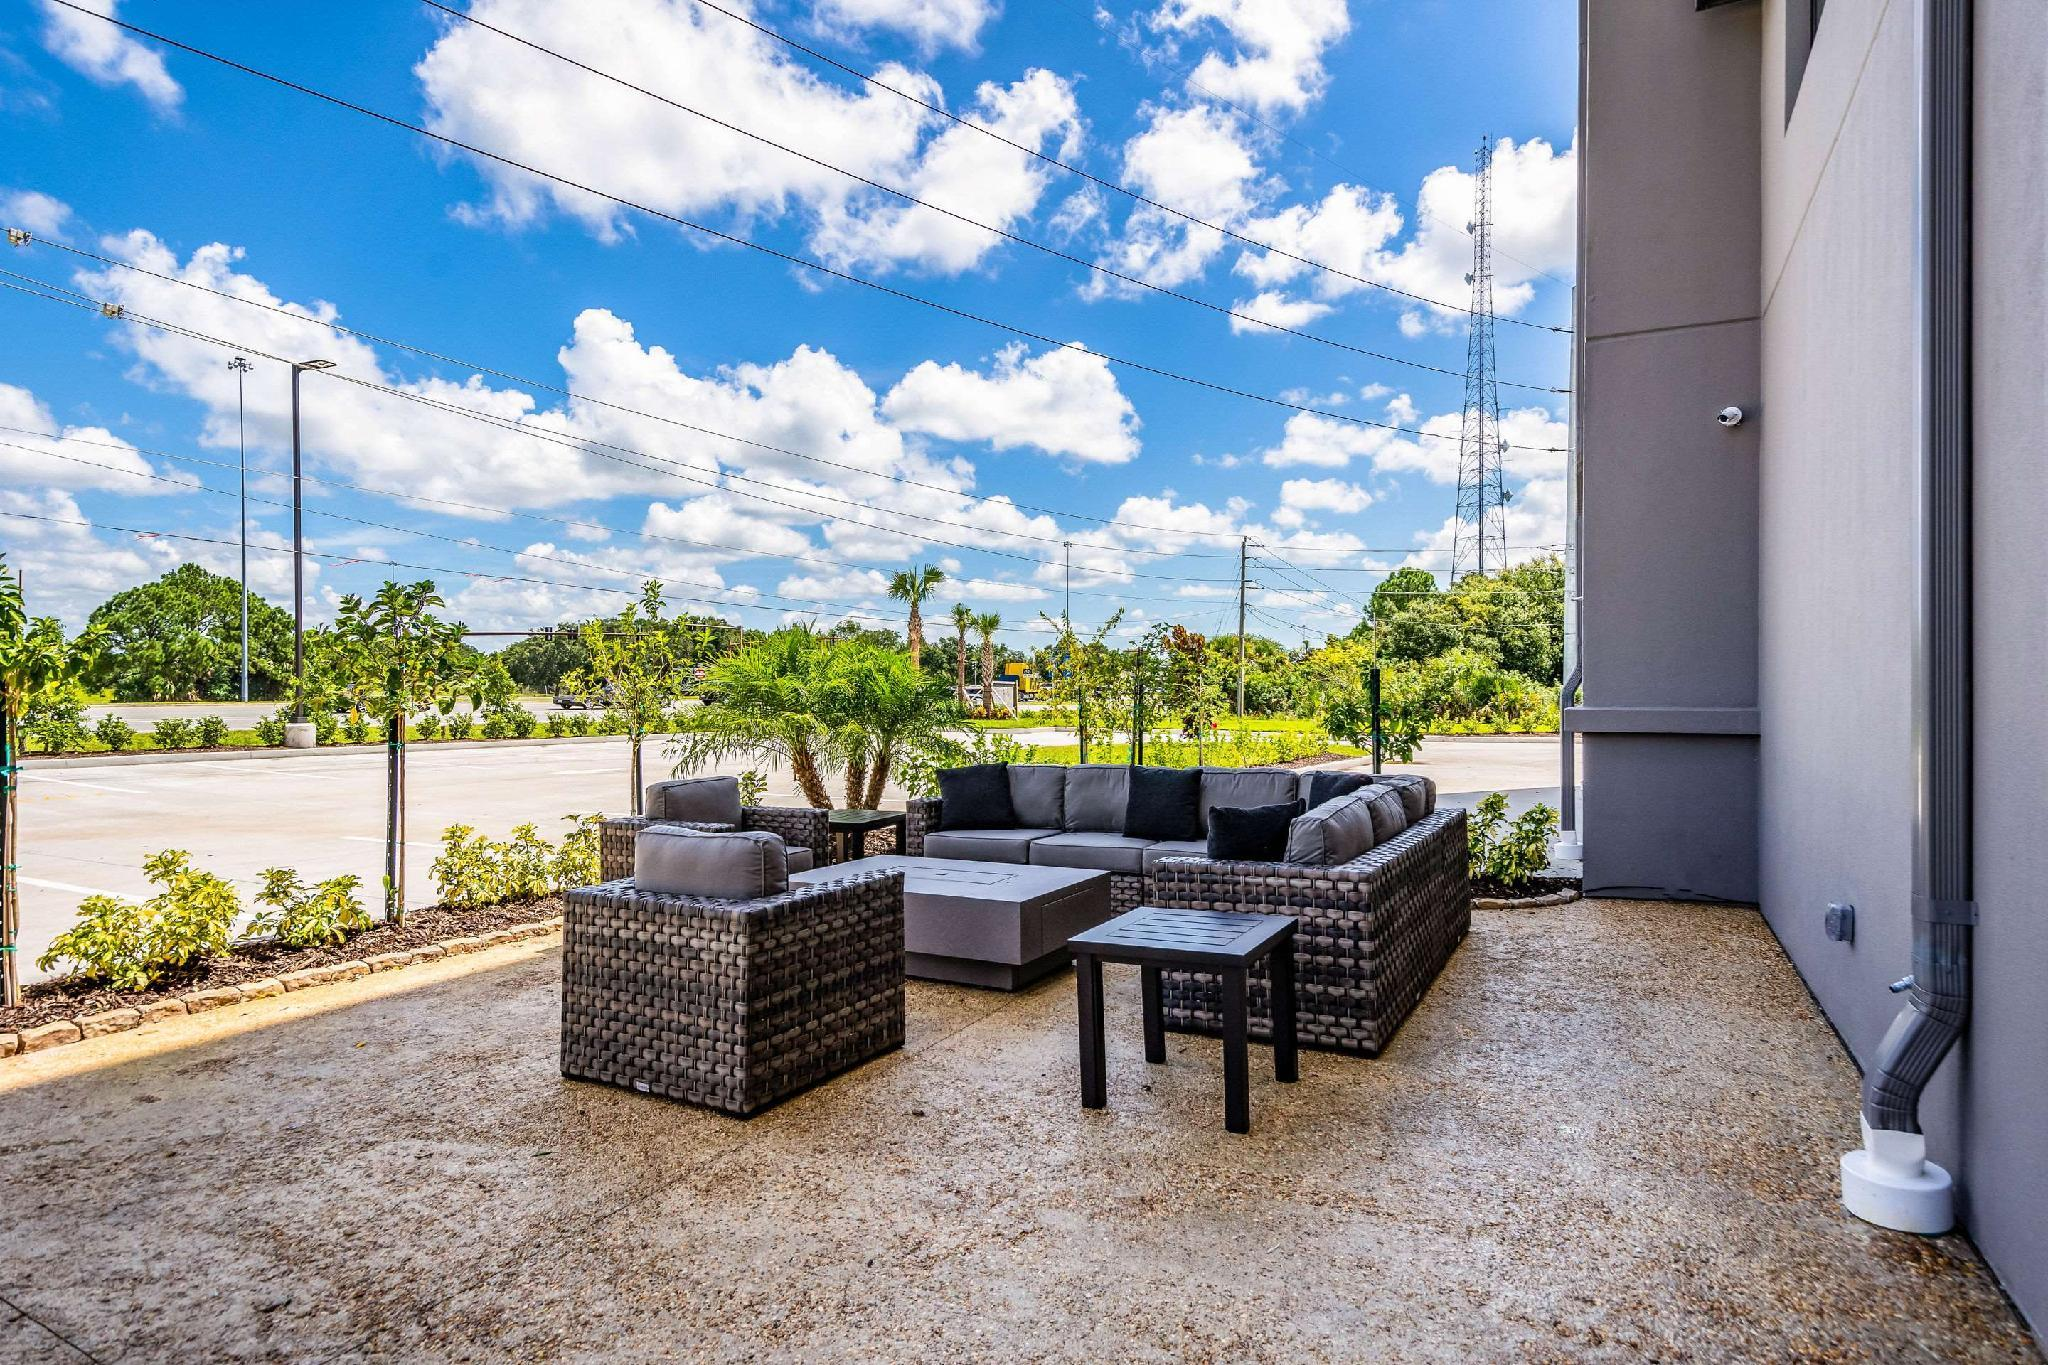 MainStay Suites Sarasota I 75